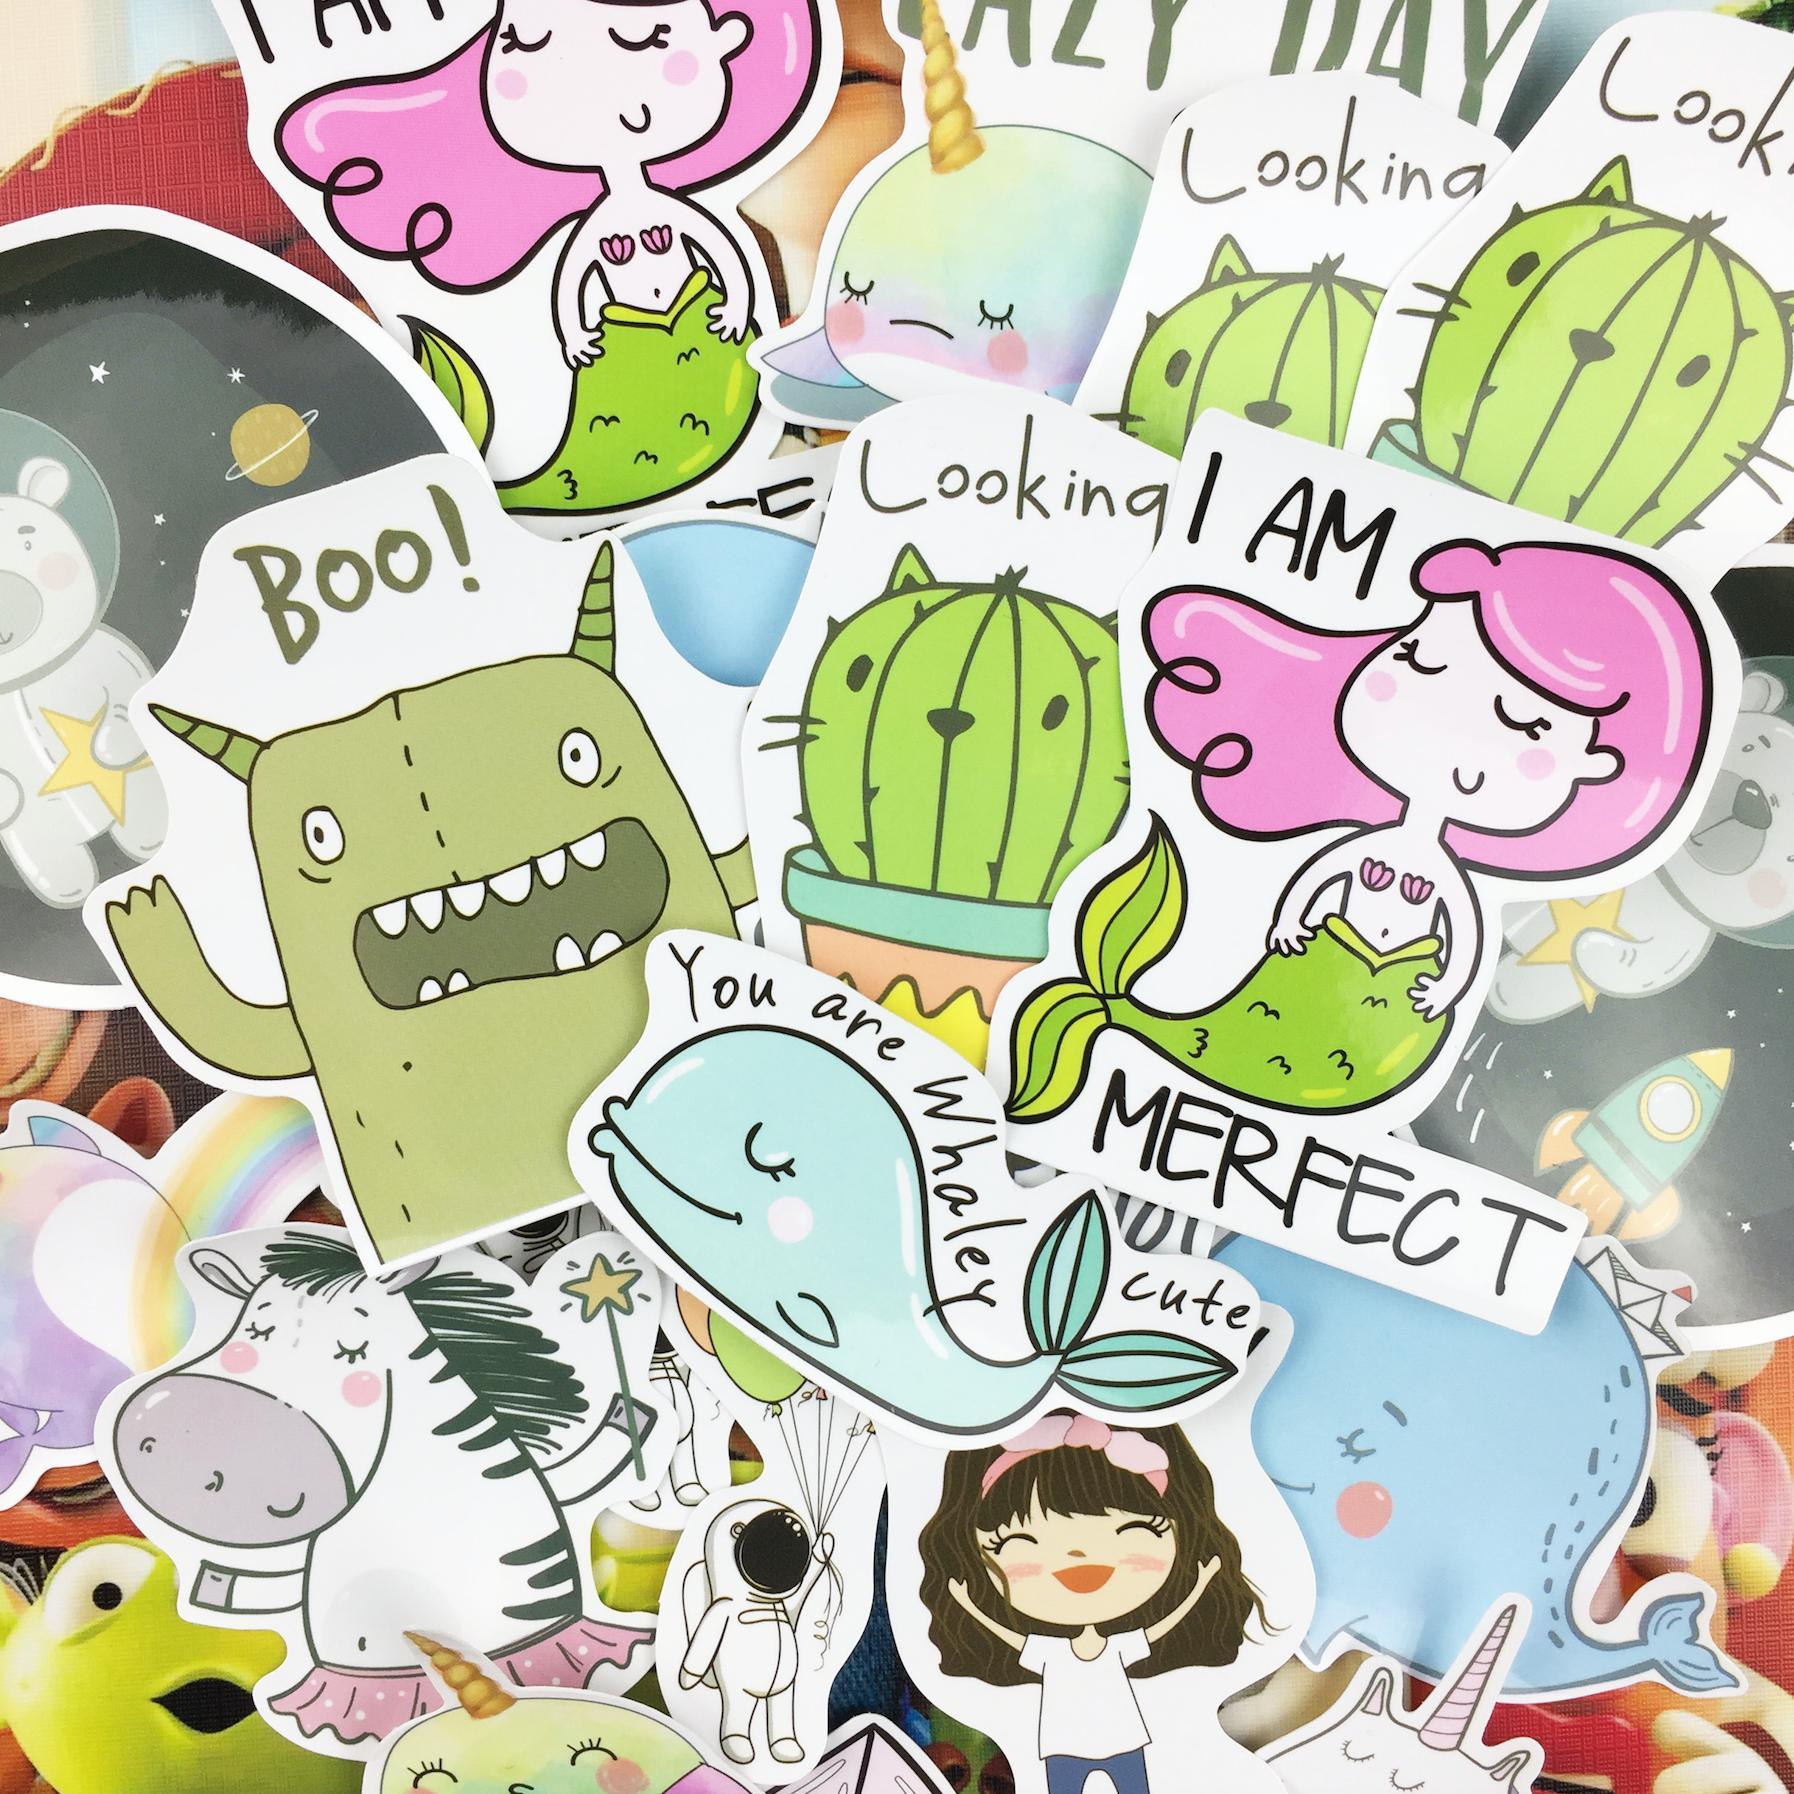 Sticker Bomb (Pack of 40) Cute Sticker funny sticker decal craft supplies